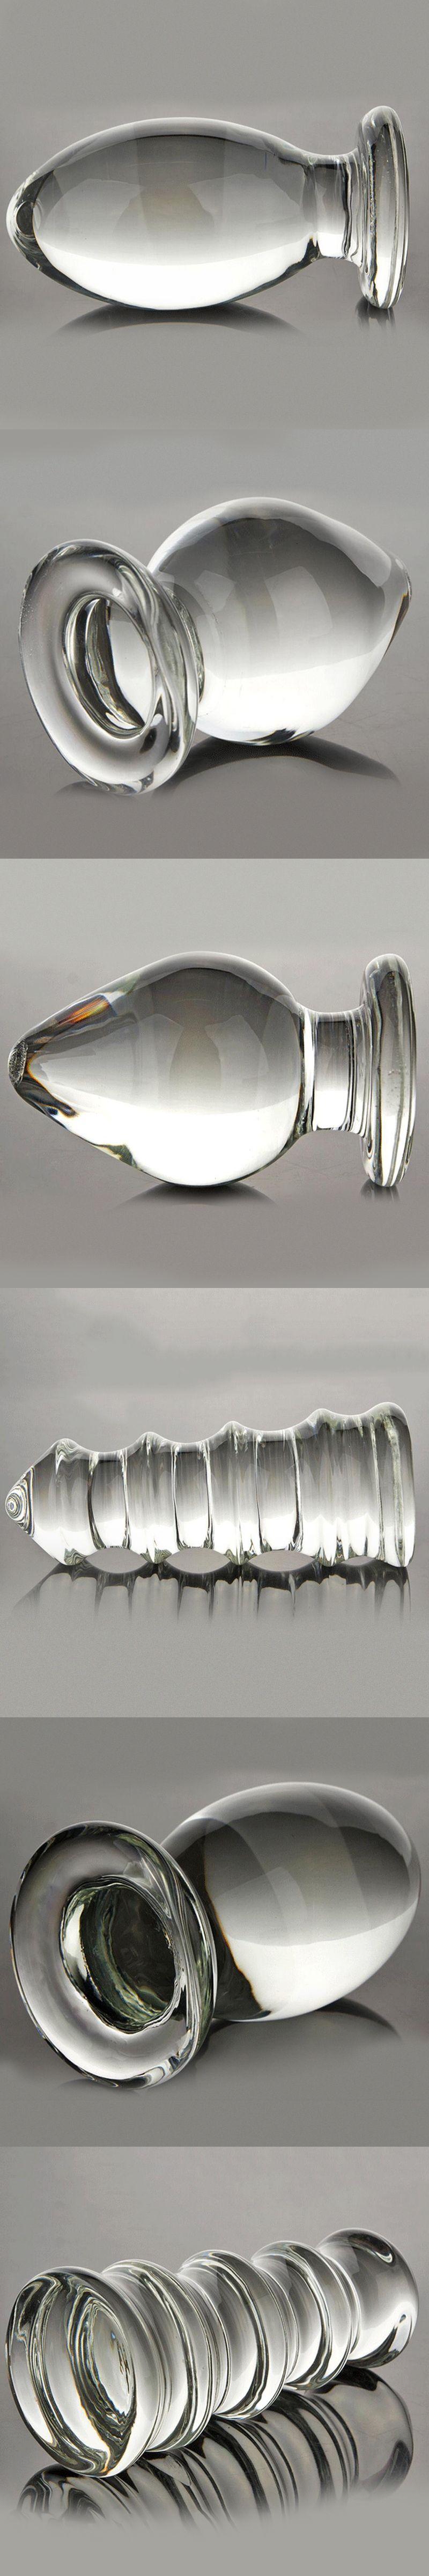 Glass Cigar Tube Anus